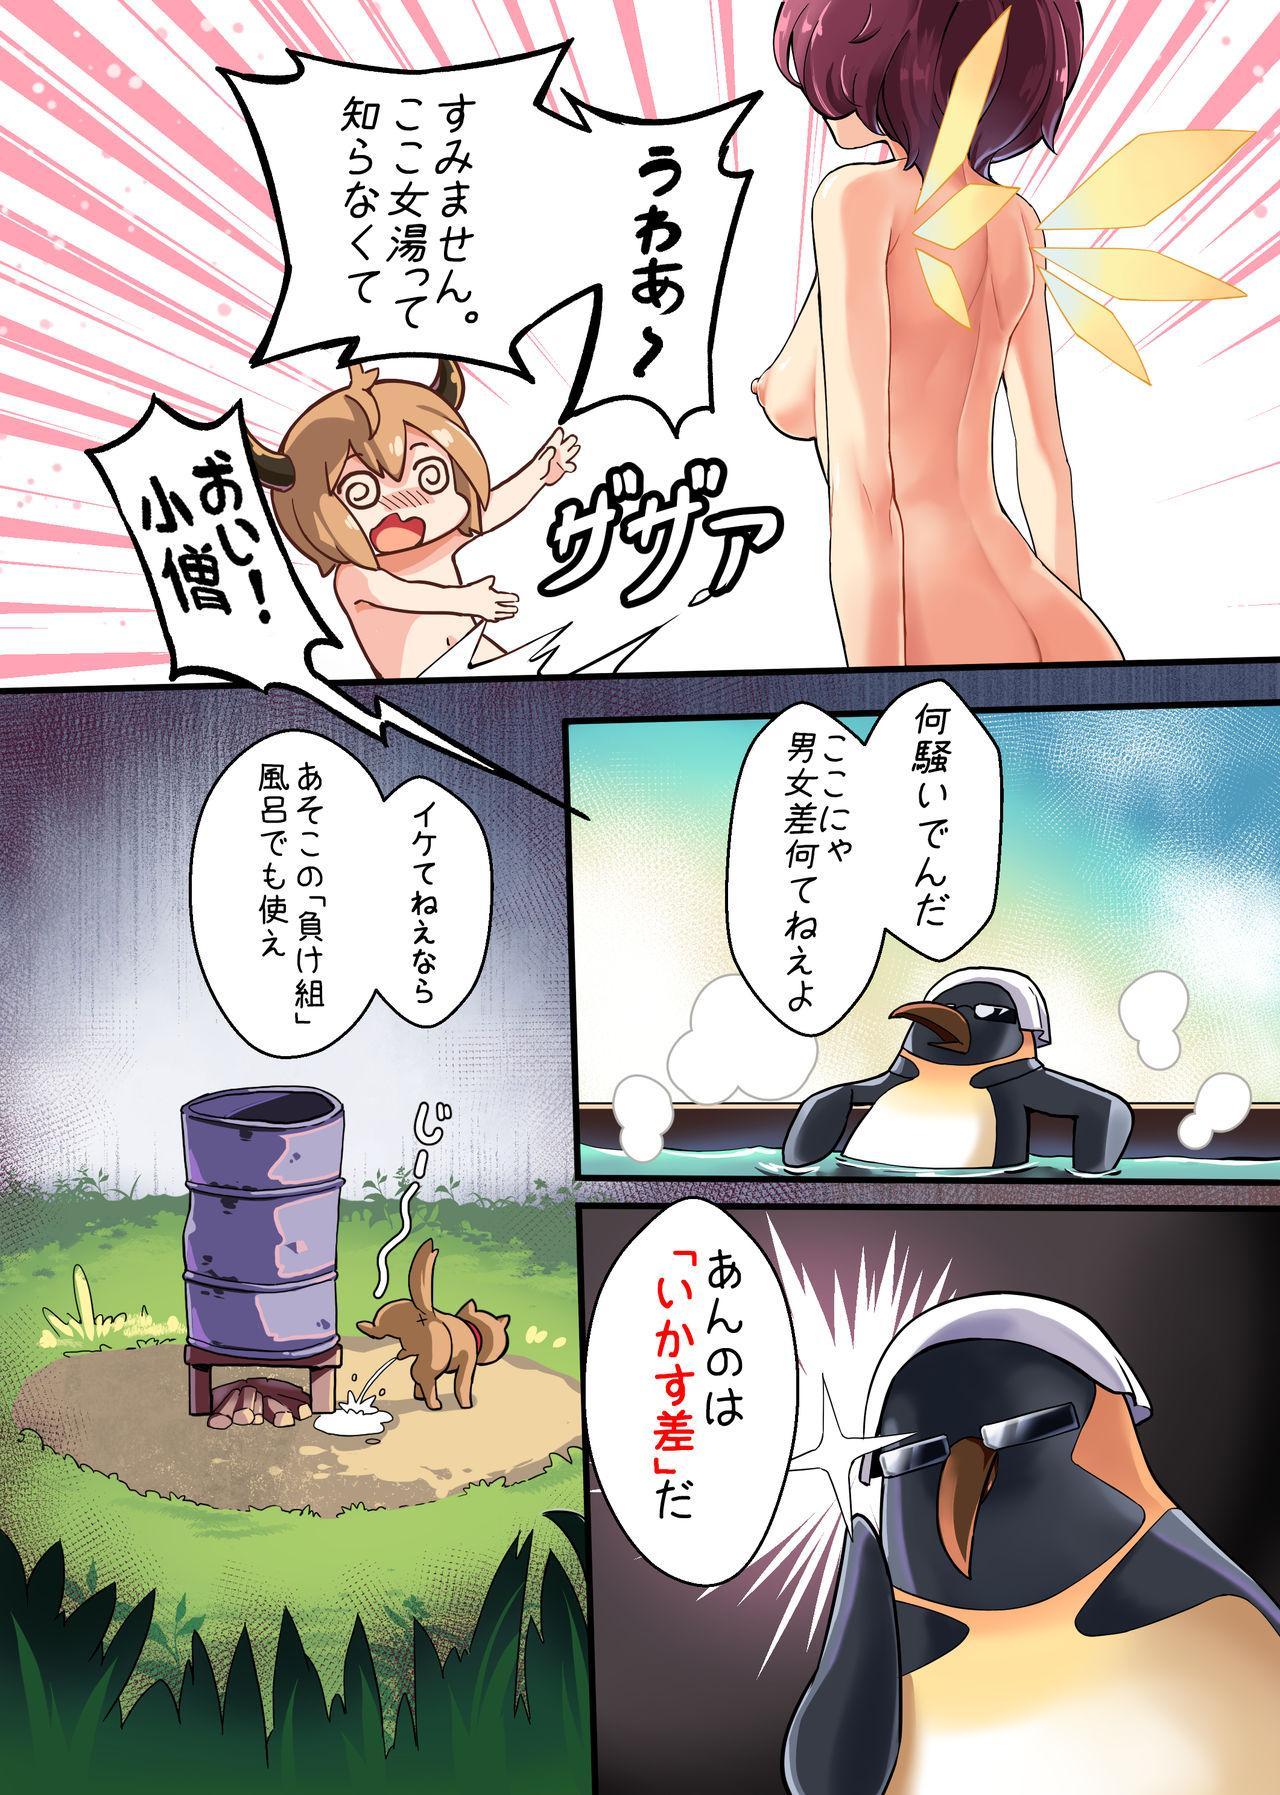 Doki Doki Penguin Bathroom 4